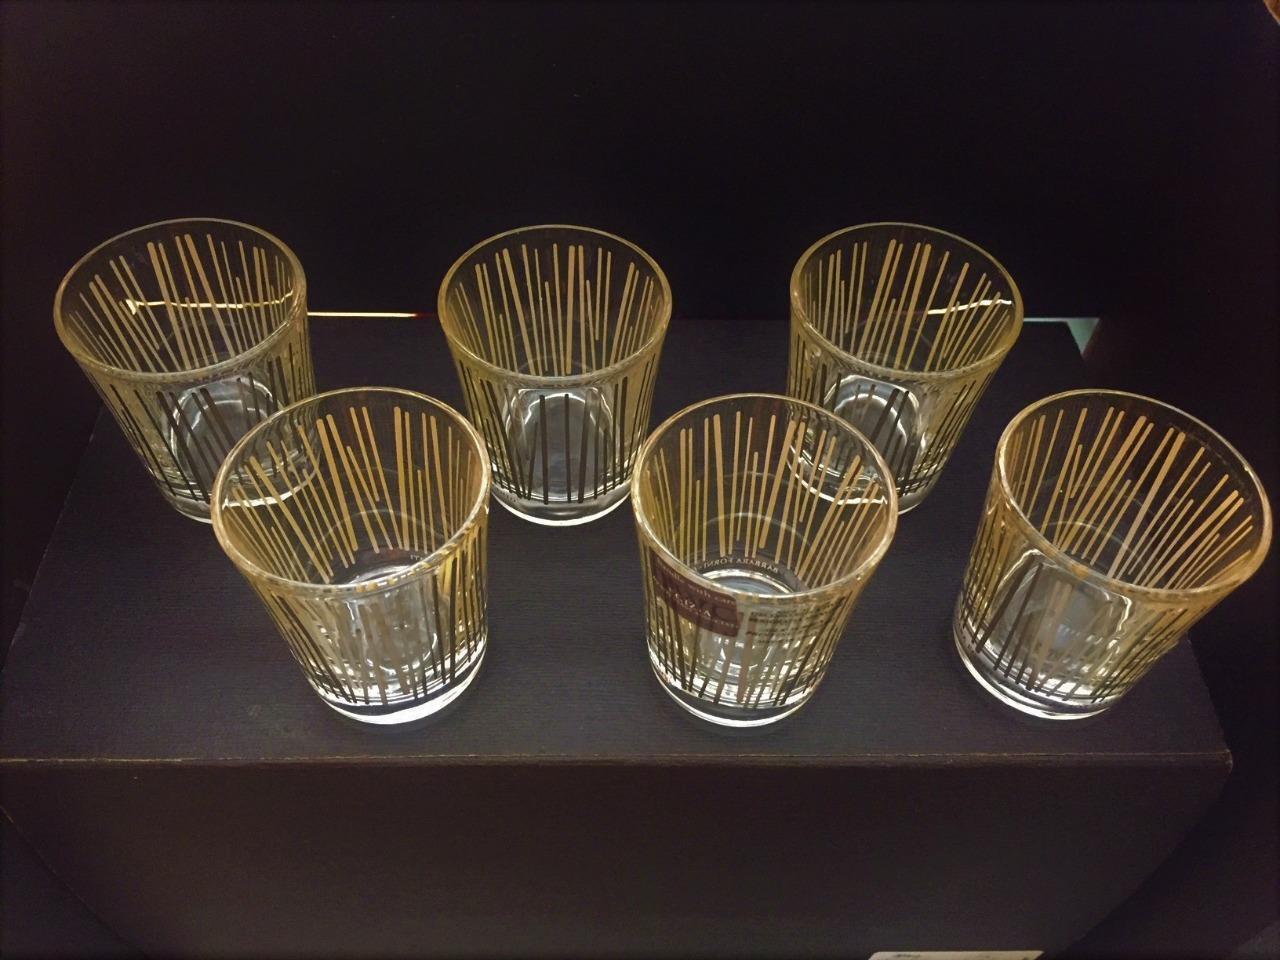 EGIZIA BAMBU' SET OF 6 GLASSES 2001 Made in  Brand new in box Free Shipping